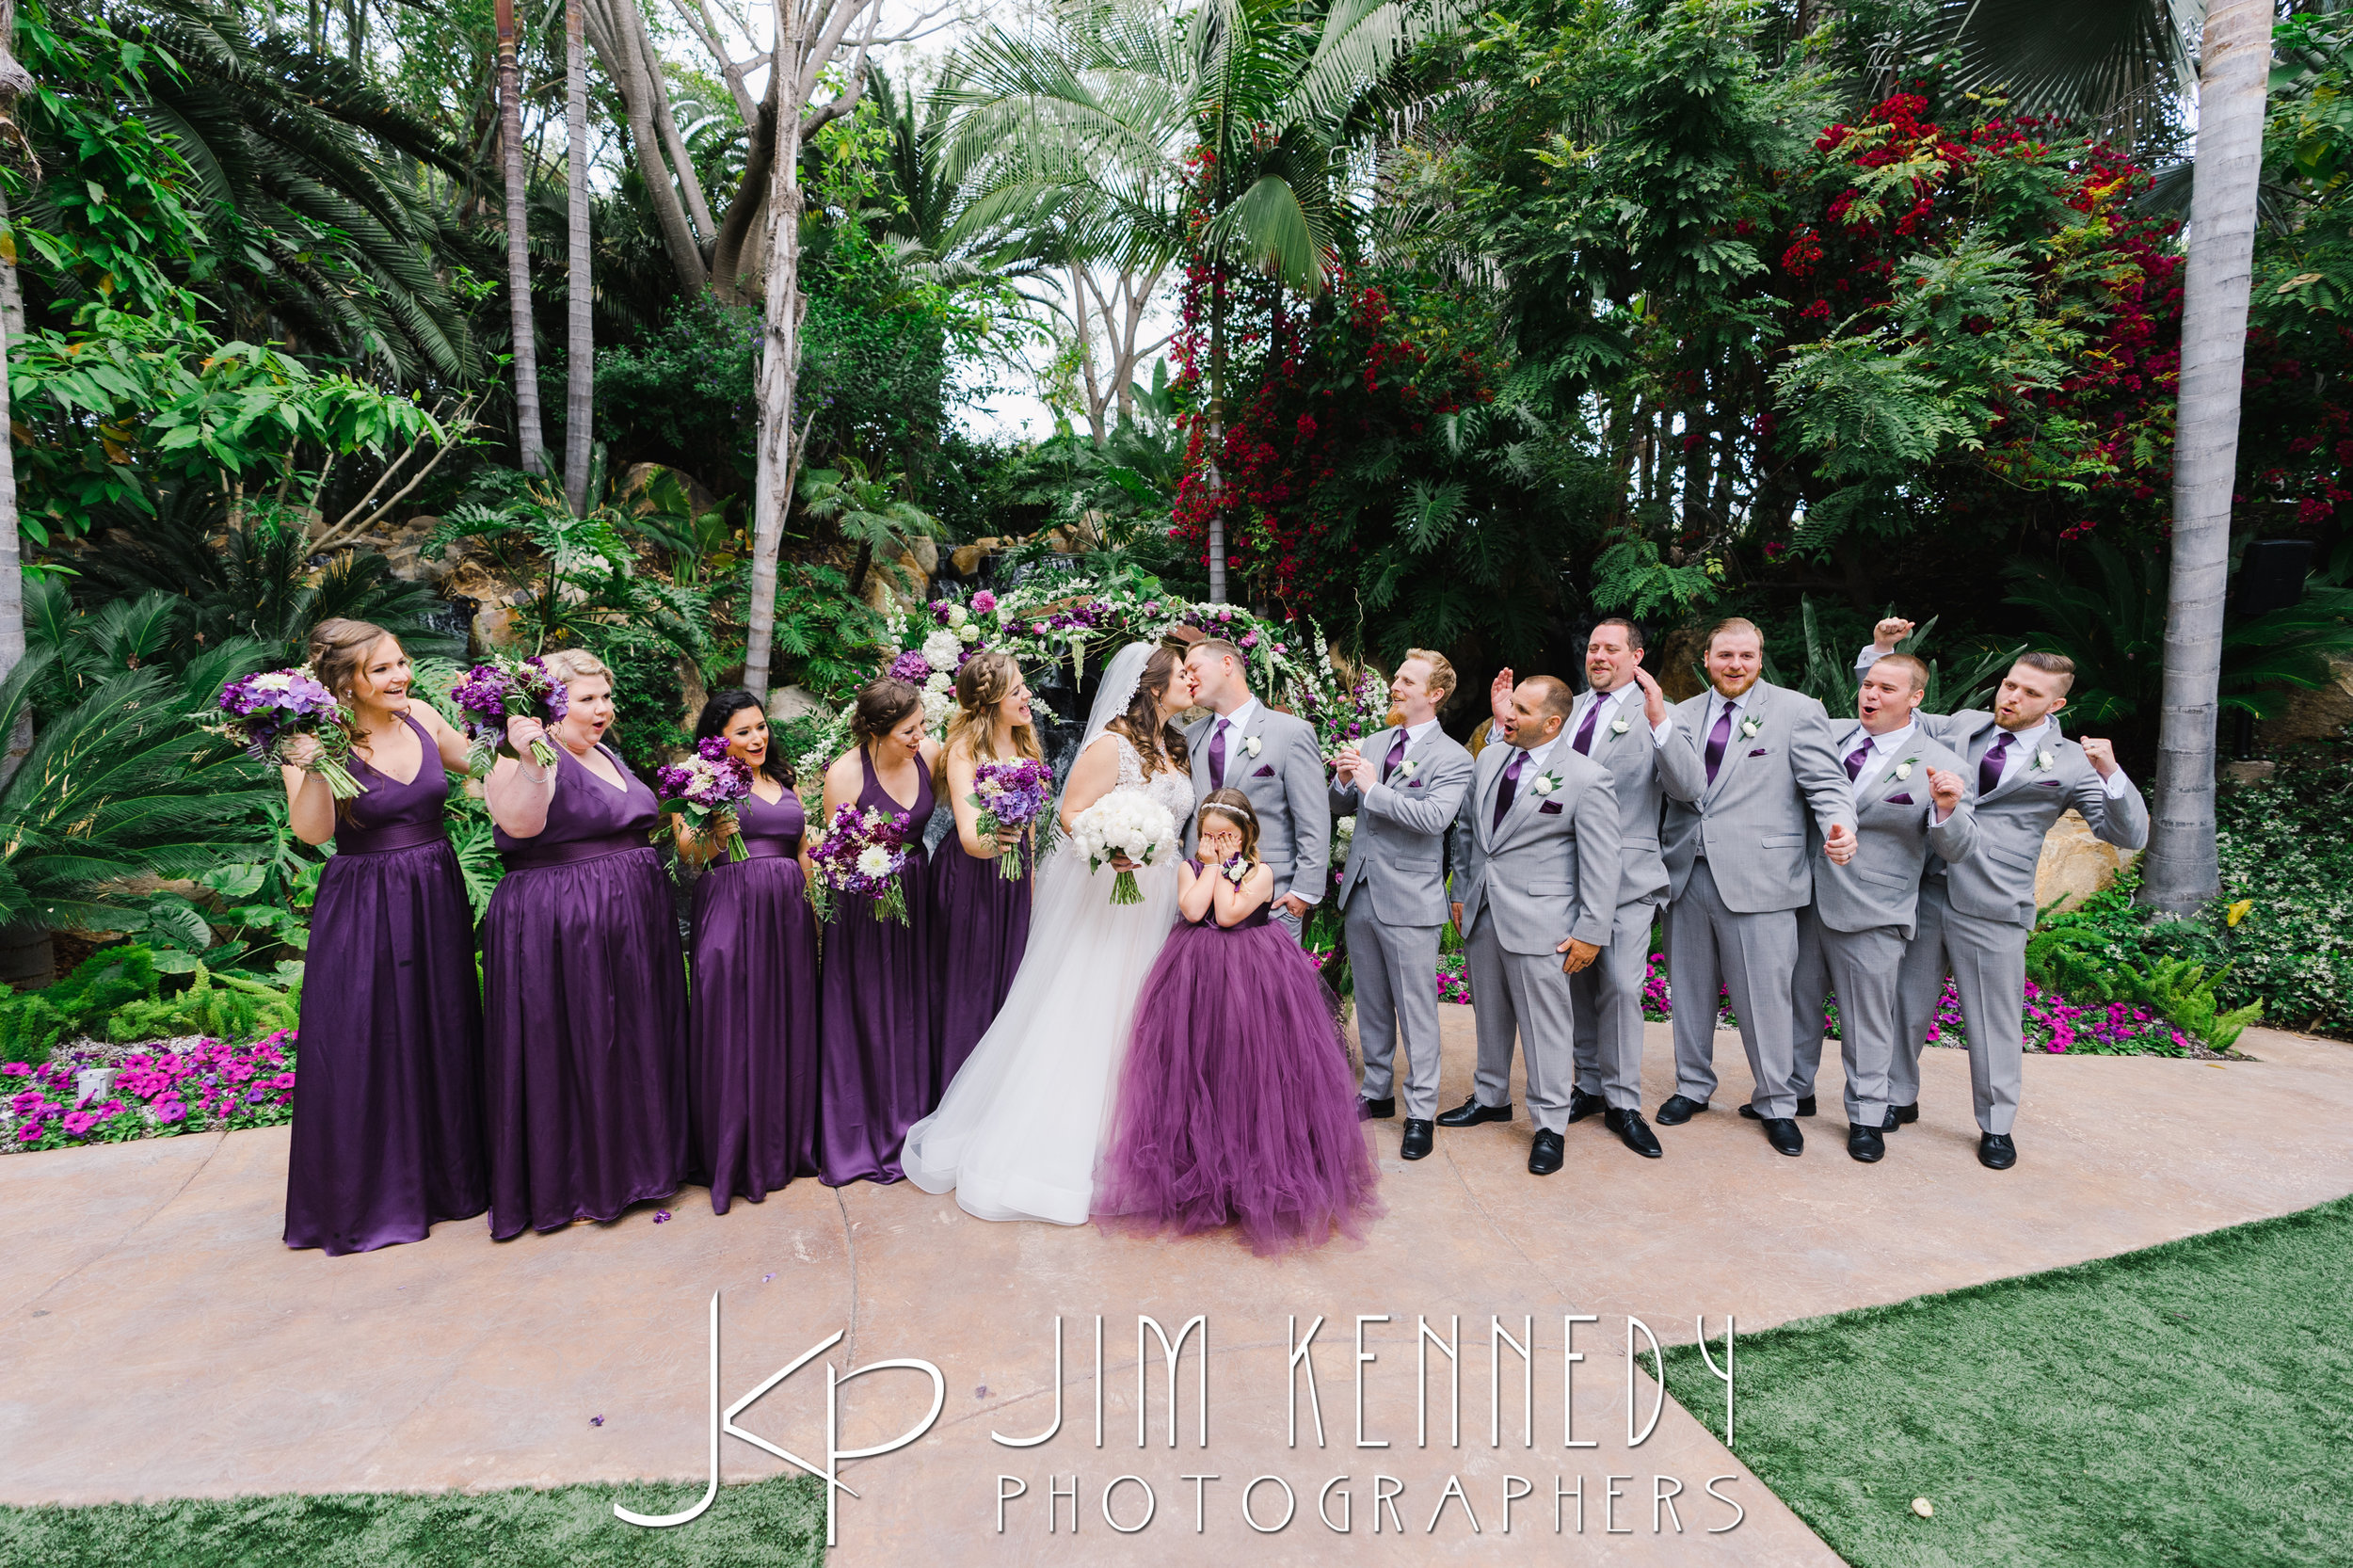 grand-tradition-Lauren-Ryan__0122.JPG